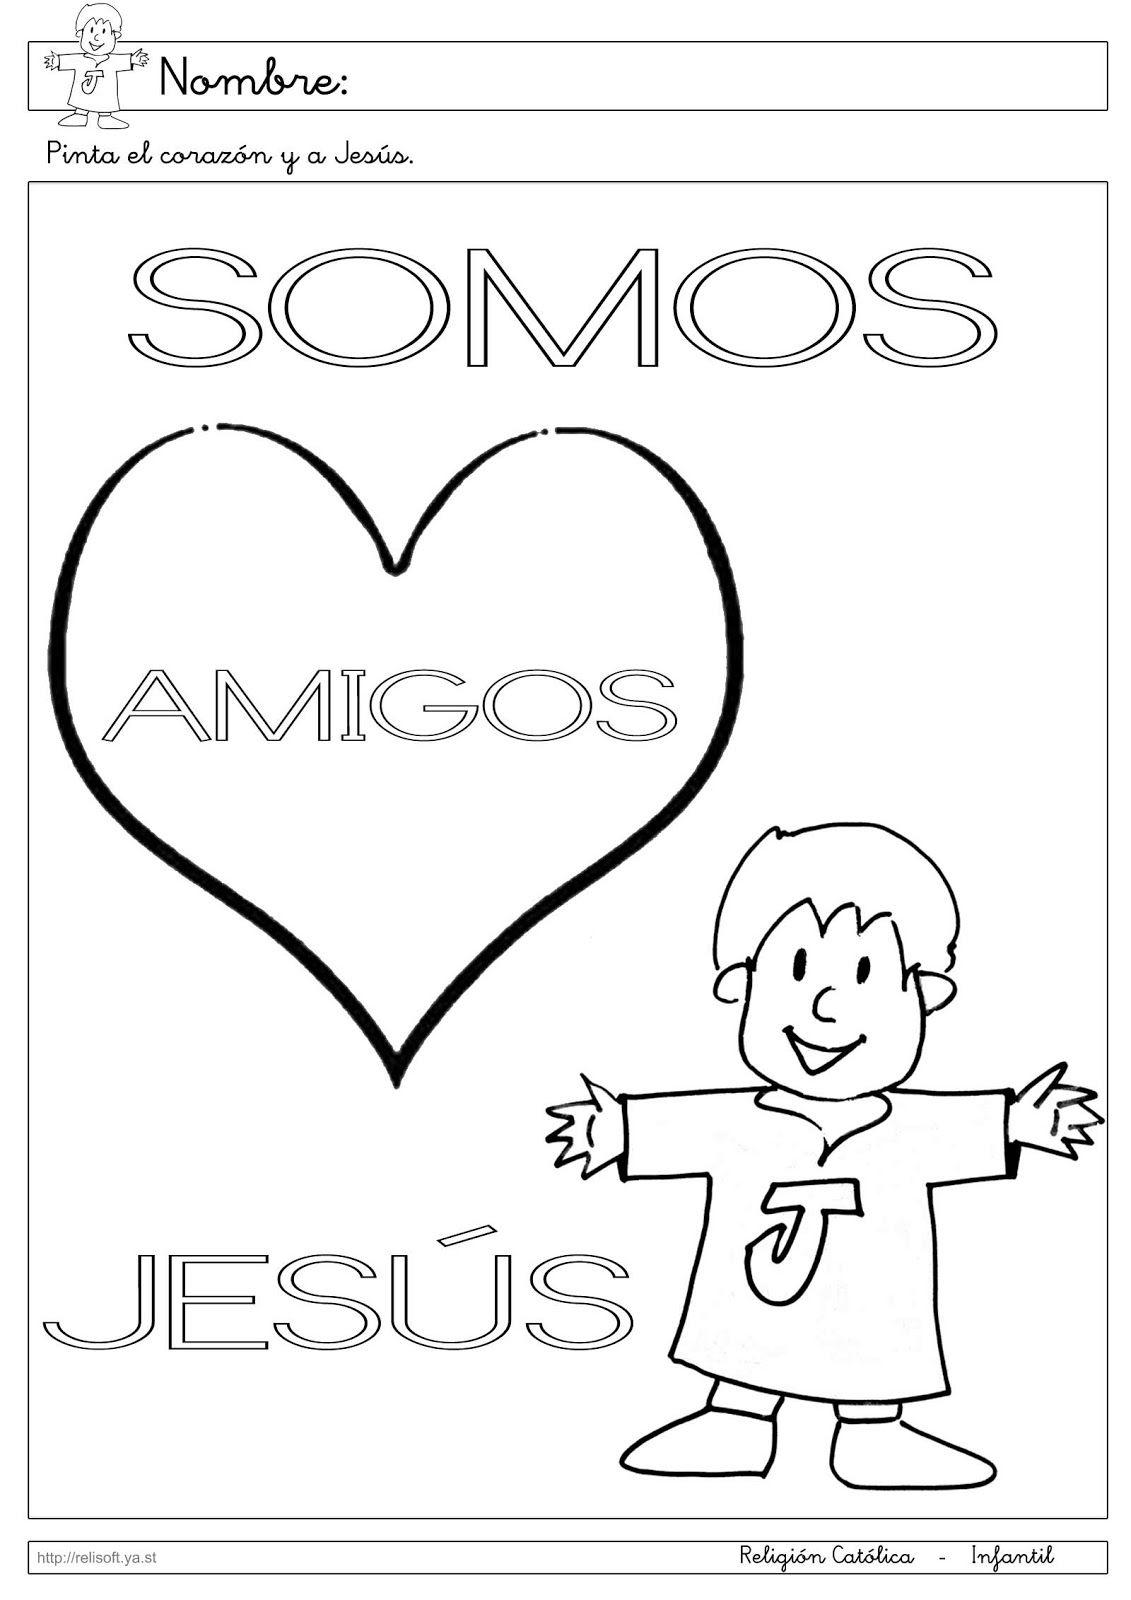 Recursos Religion Católica Fichas Infantil 3 Años Escuela Bíblica